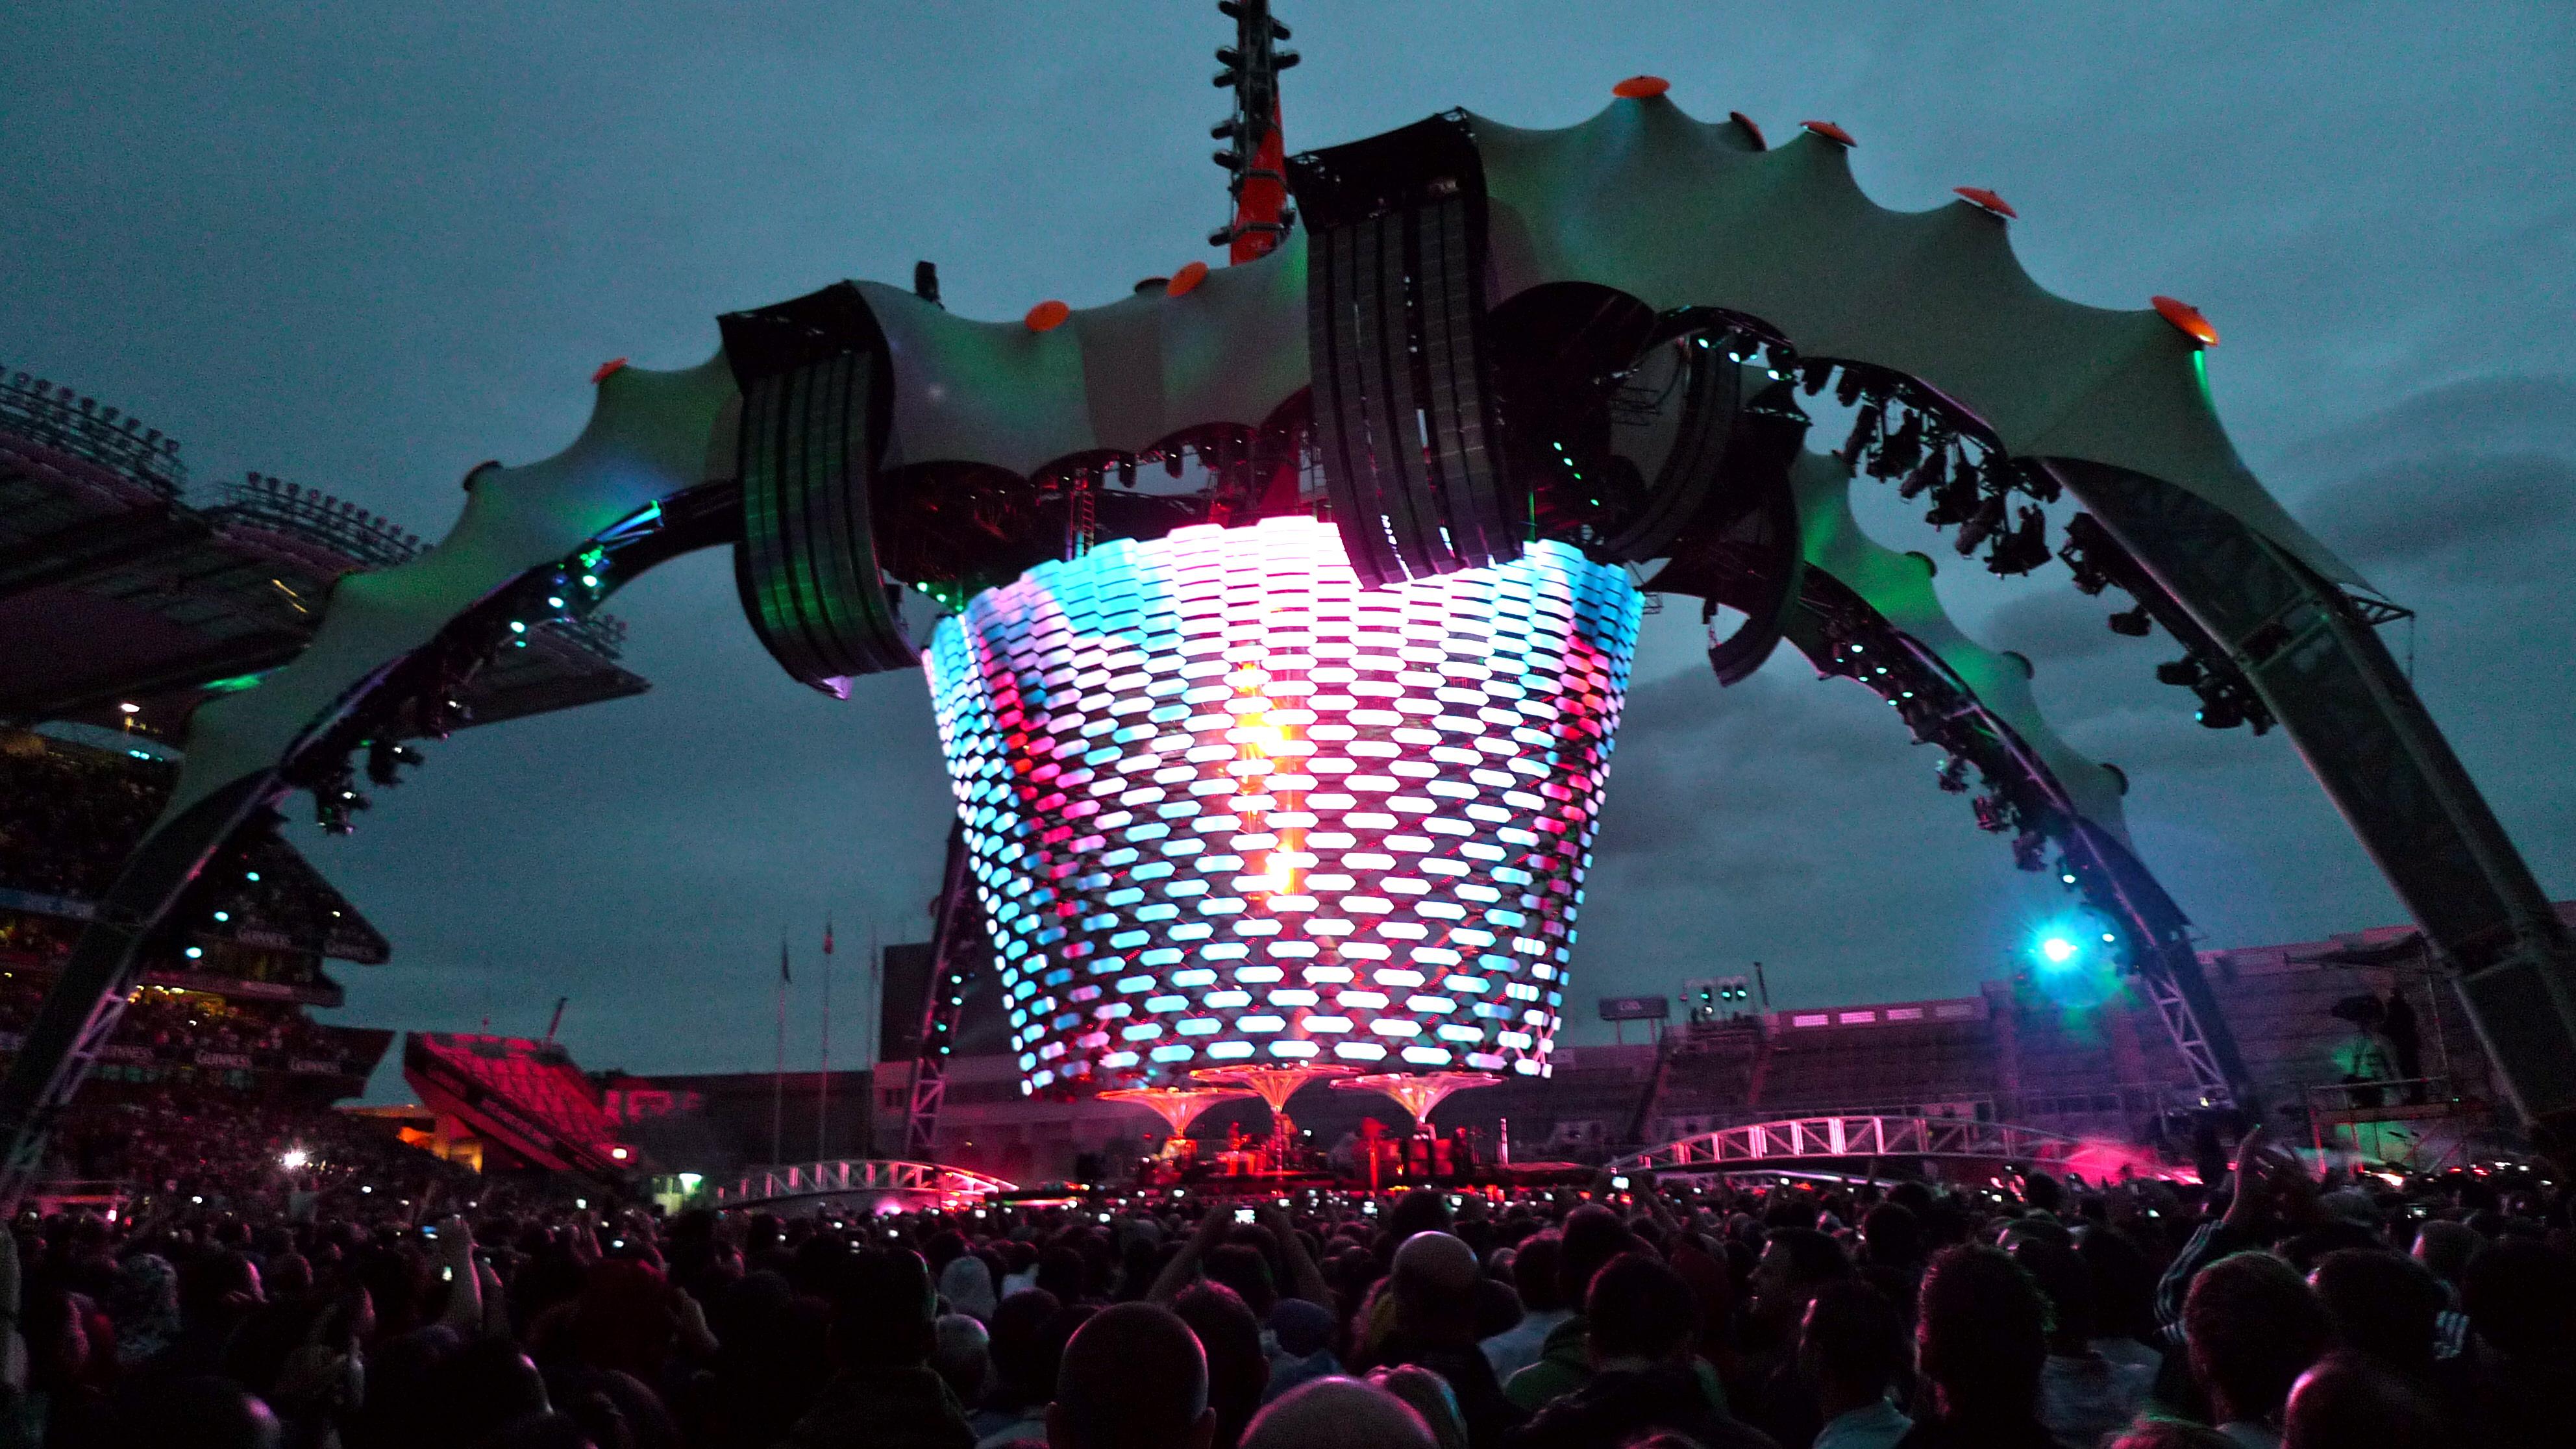 U2_360_Tour_Croke_Park_2